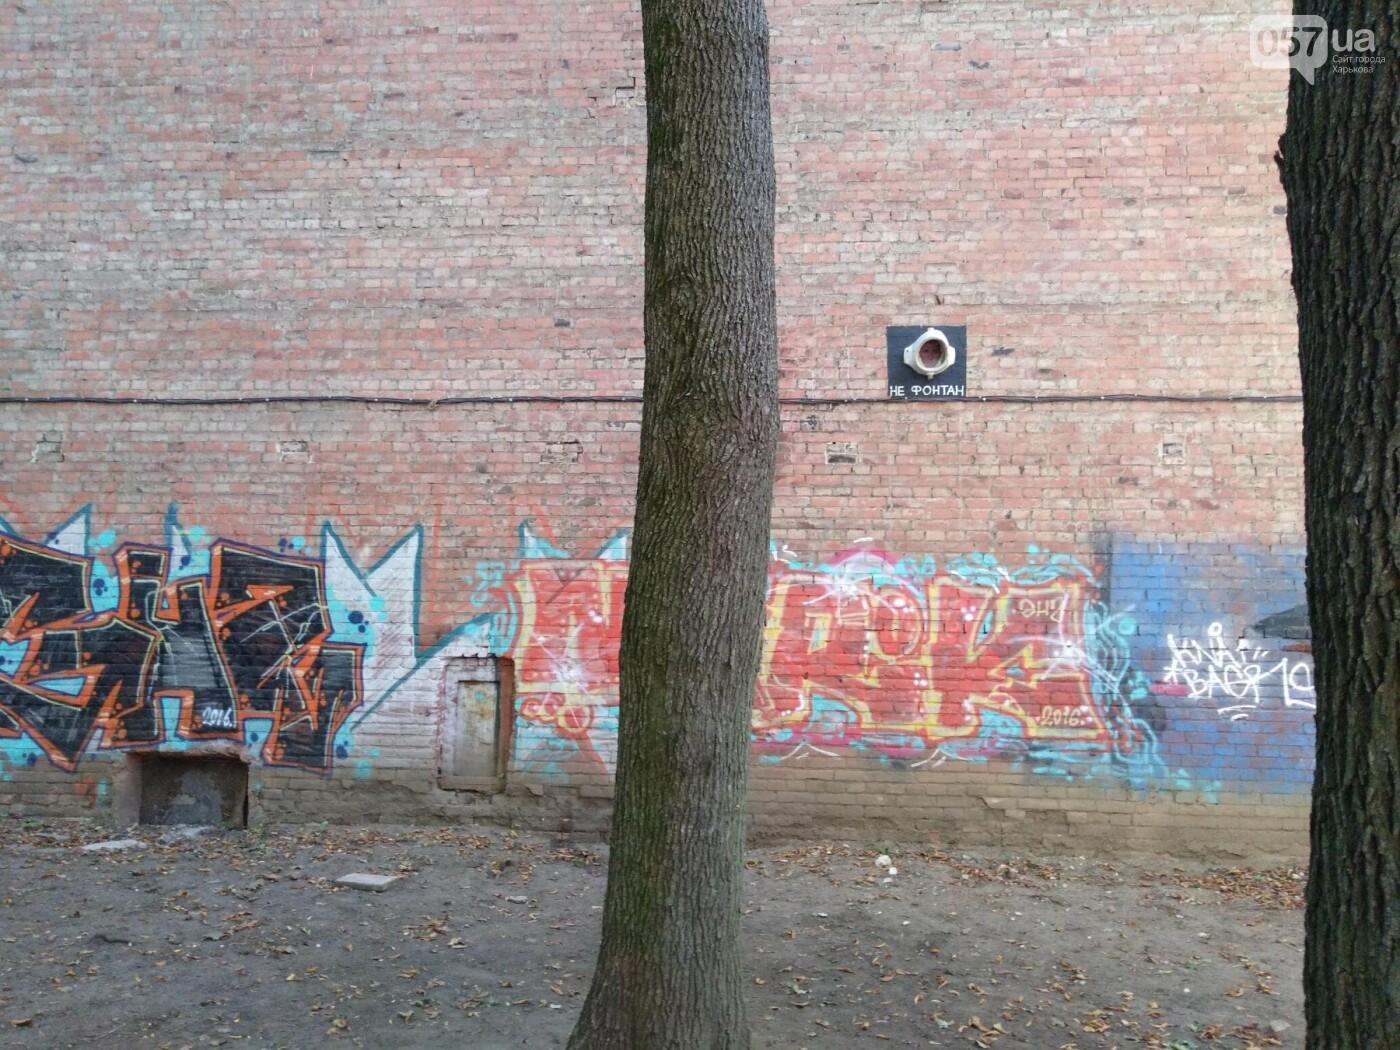 Стрит-арт Гамлета в Харькове: ТОП-10 граффити художника, - ФОТО, фото-13